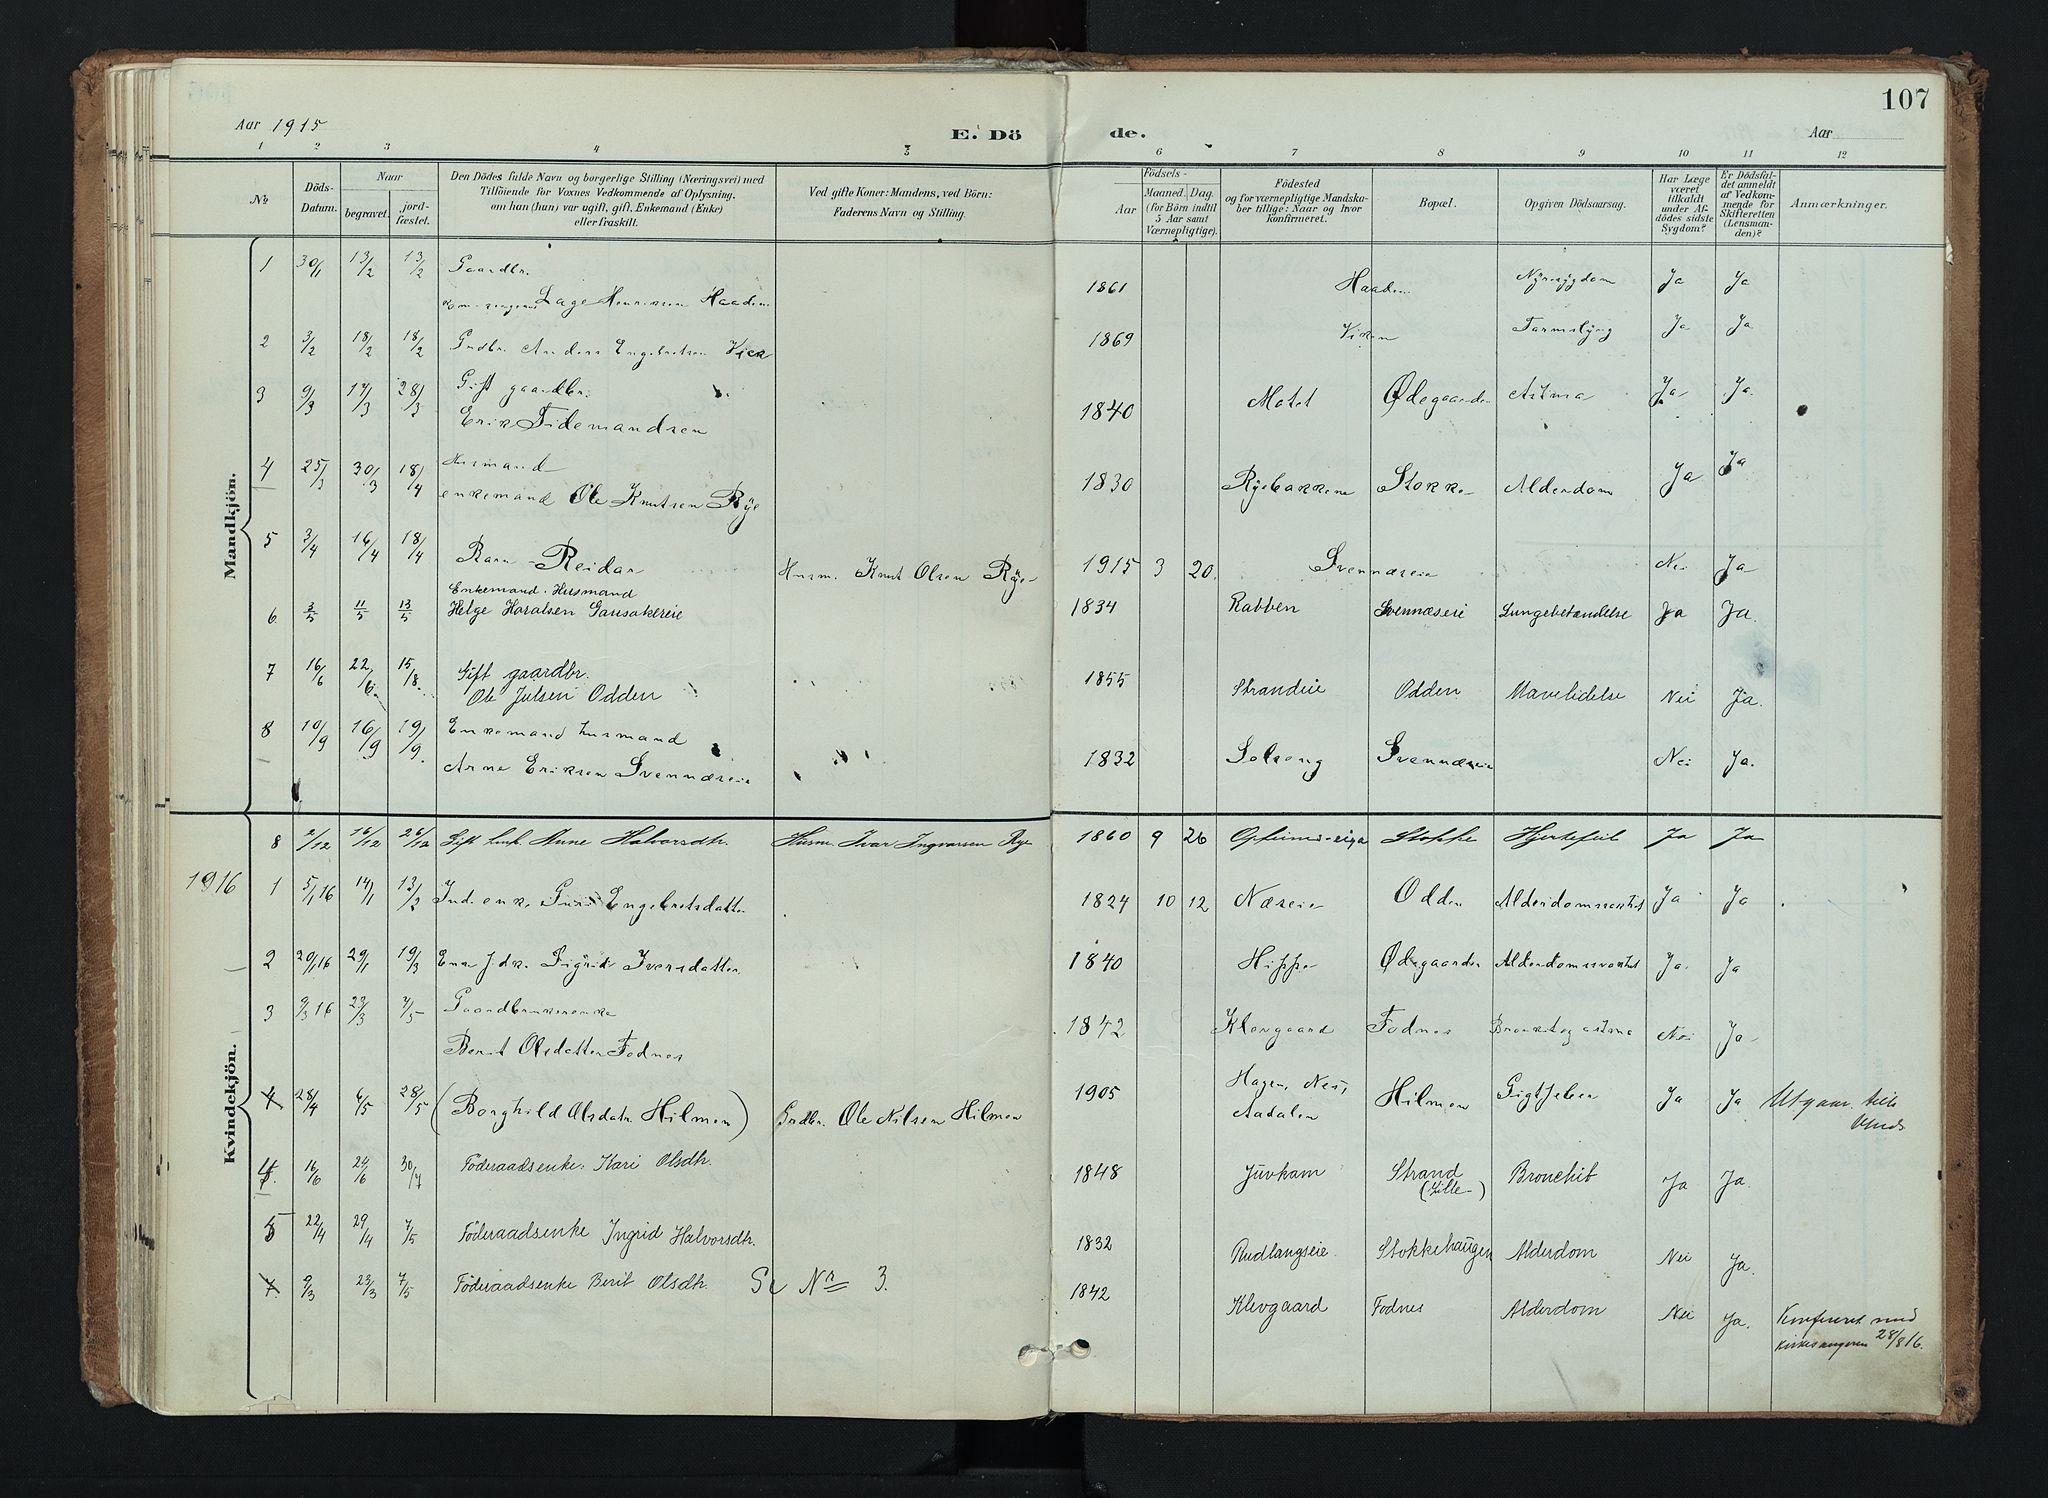 SAH, Nord-Aurdal prestekontor, Ministerialbok nr. 16, 1897-1925, s. 107